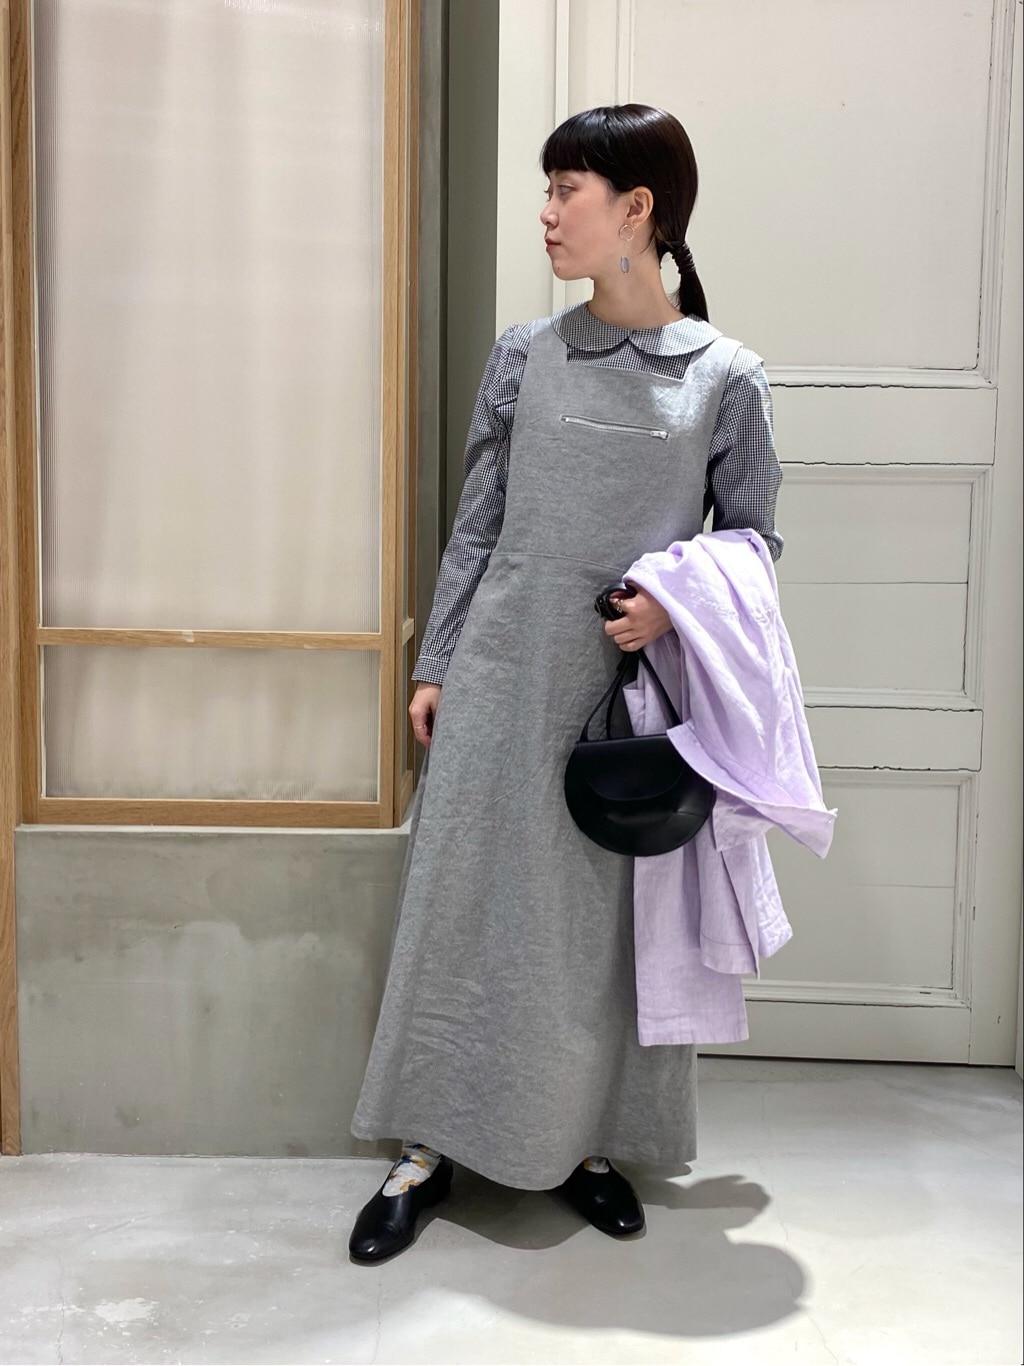 bulle de savon 渋谷スクランブルスクエア 身長:153cm 2021.03.15